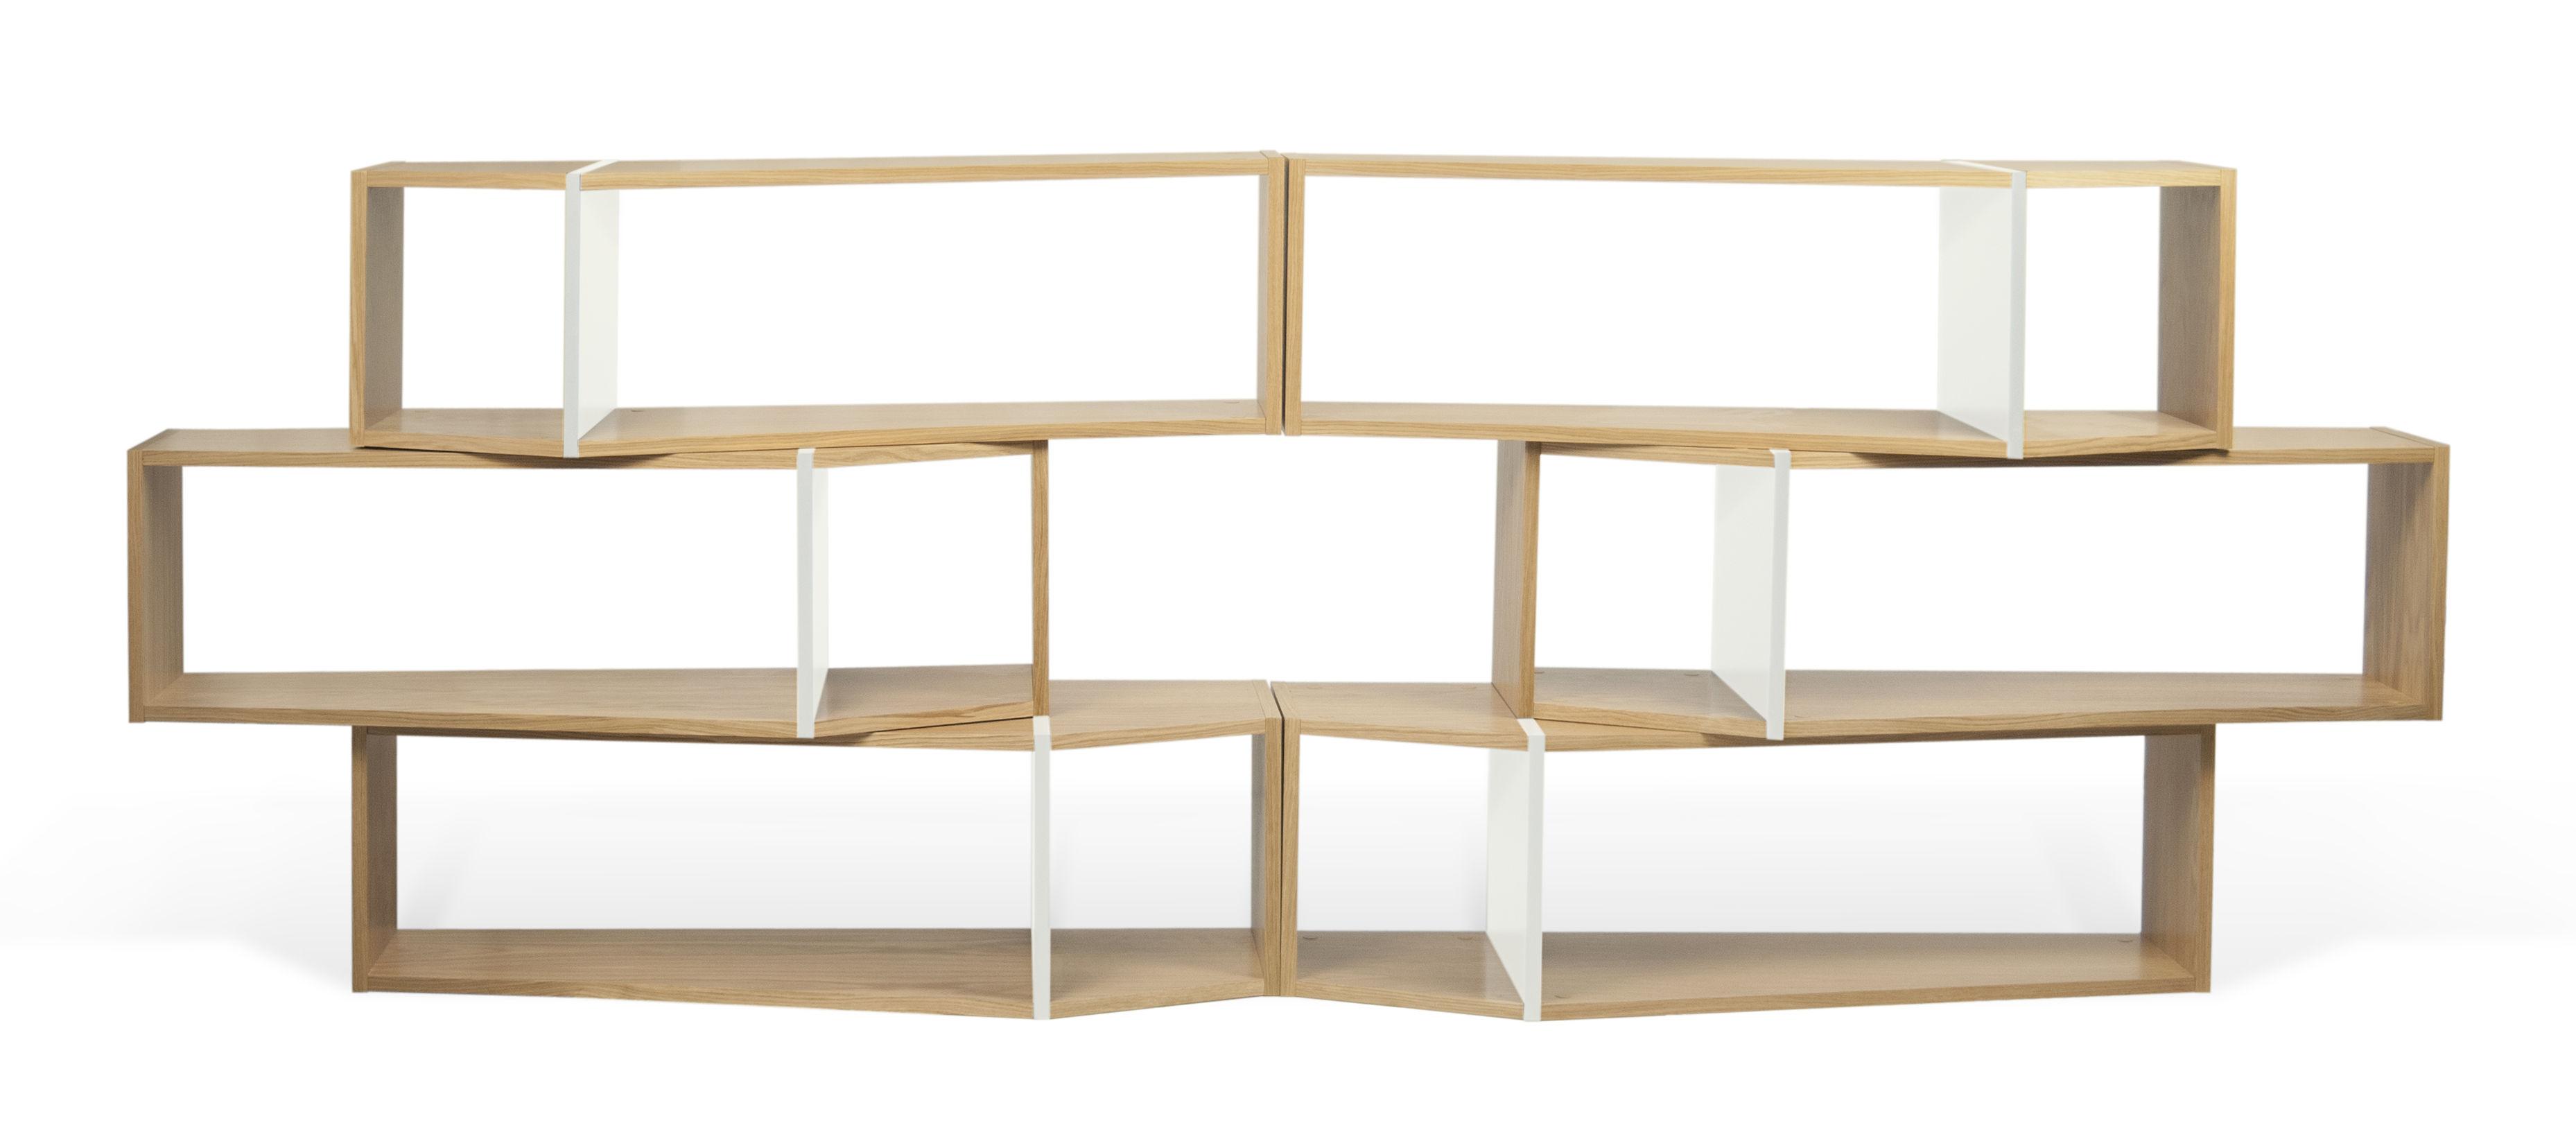 etag re rectangular l 120 x h 35 cm ch ne blanc pop up home. Black Bedroom Furniture Sets. Home Design Ideas